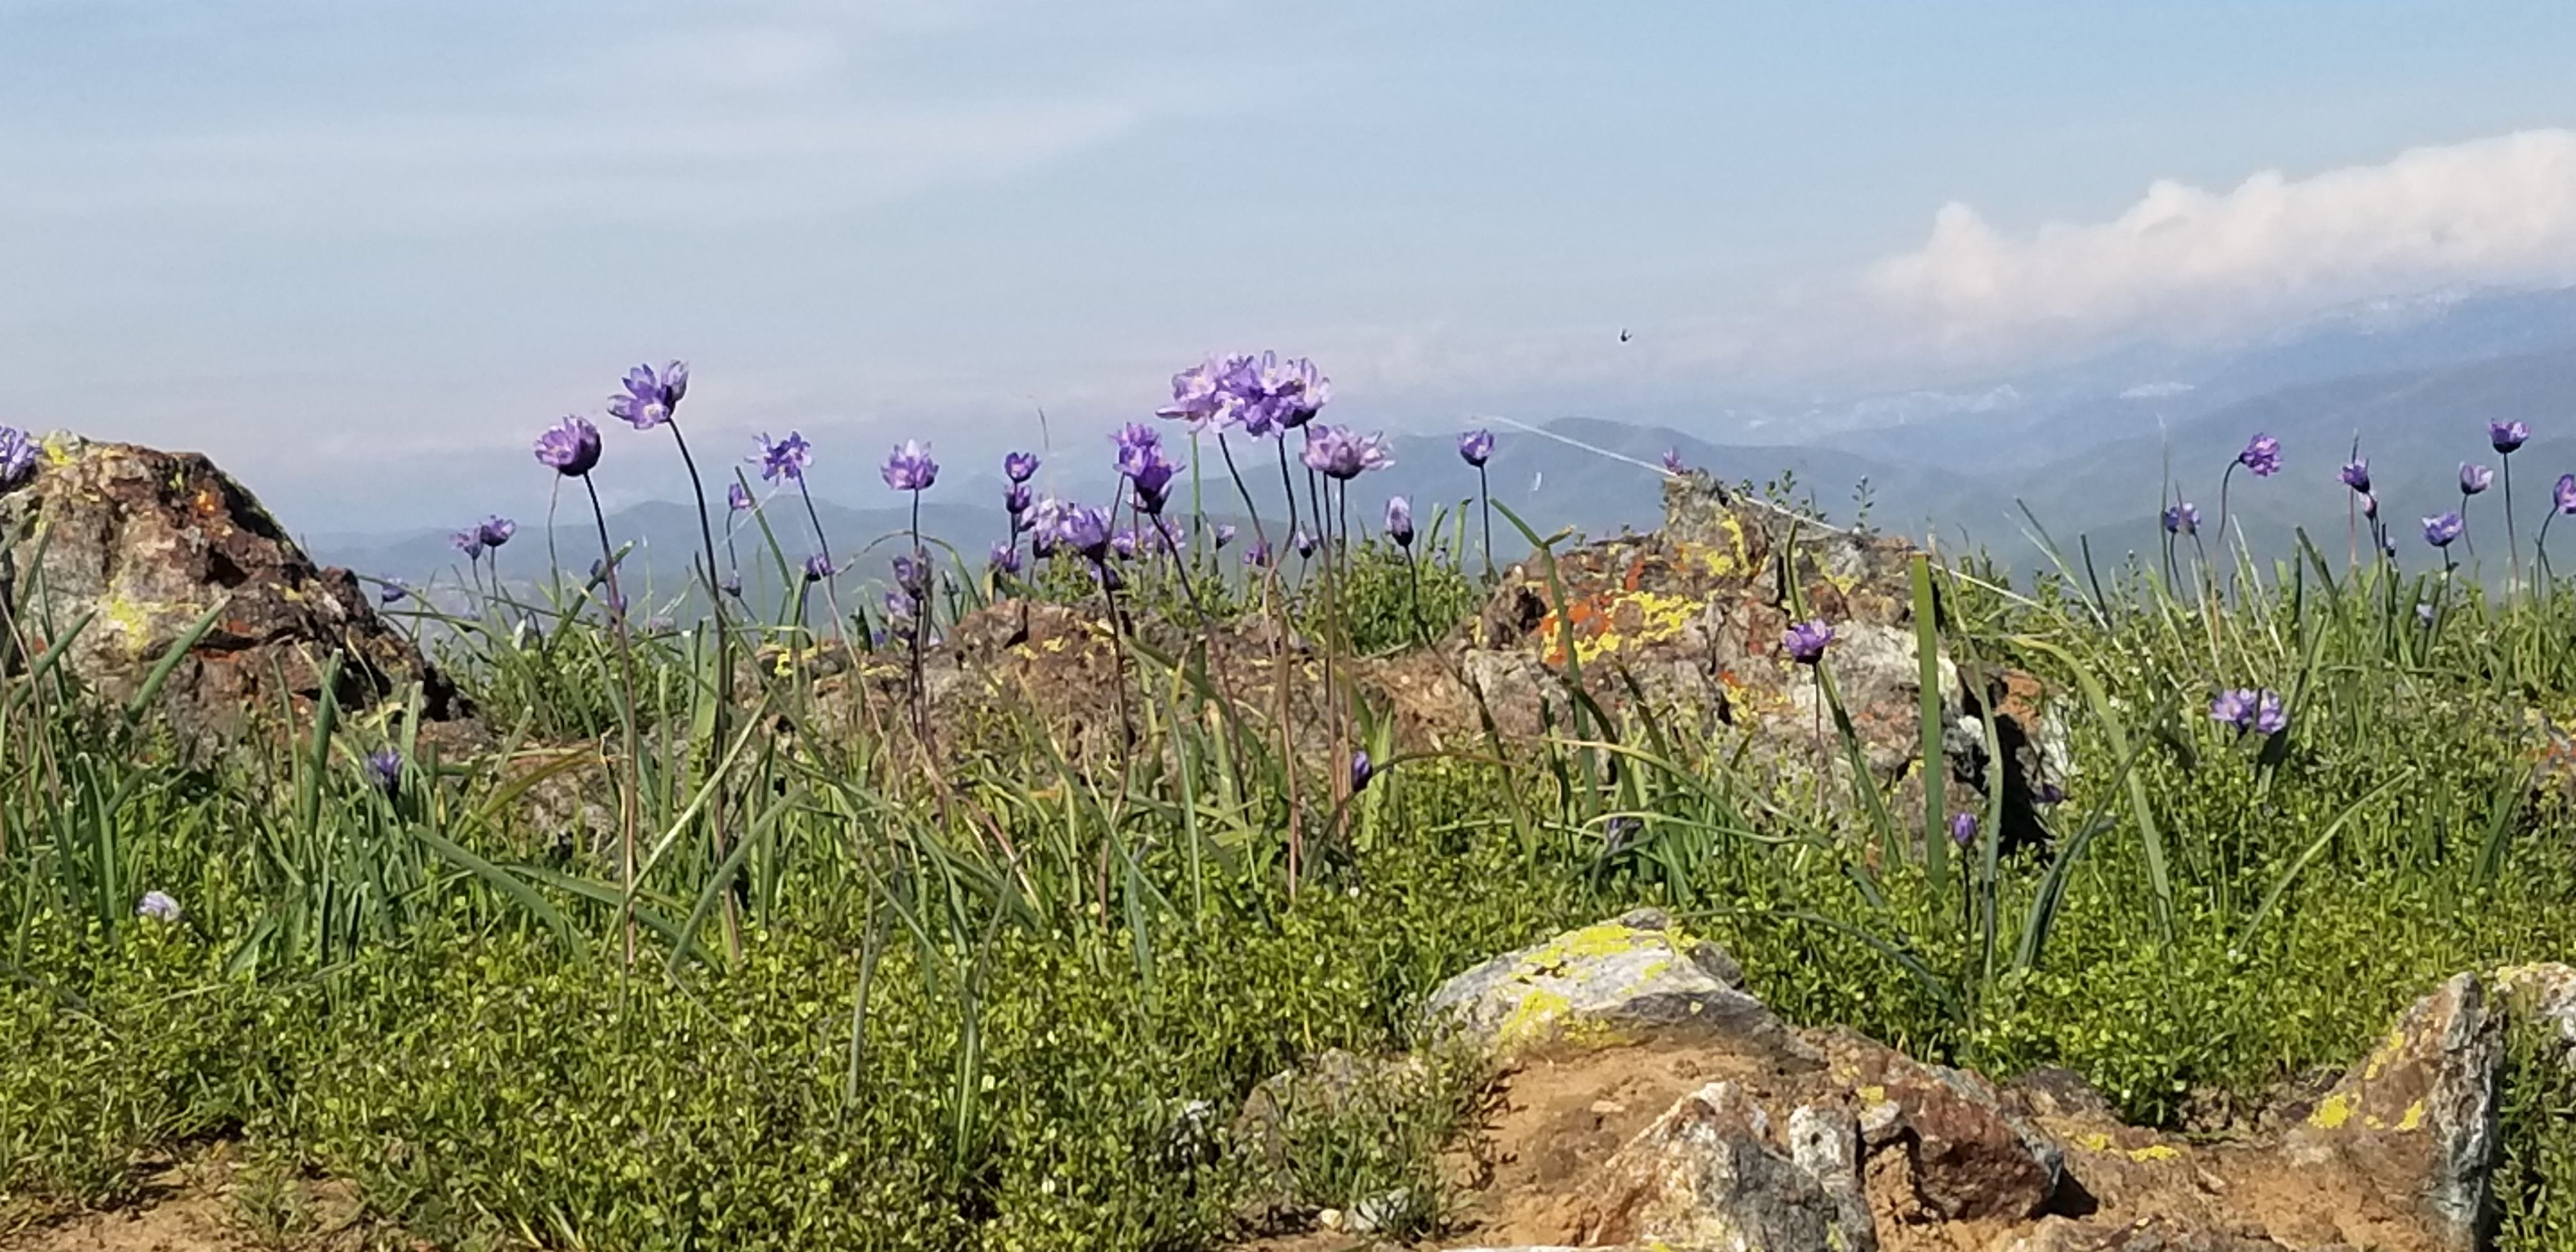 Annual Lewis Hill rare wildflower walk set for Feb. 29